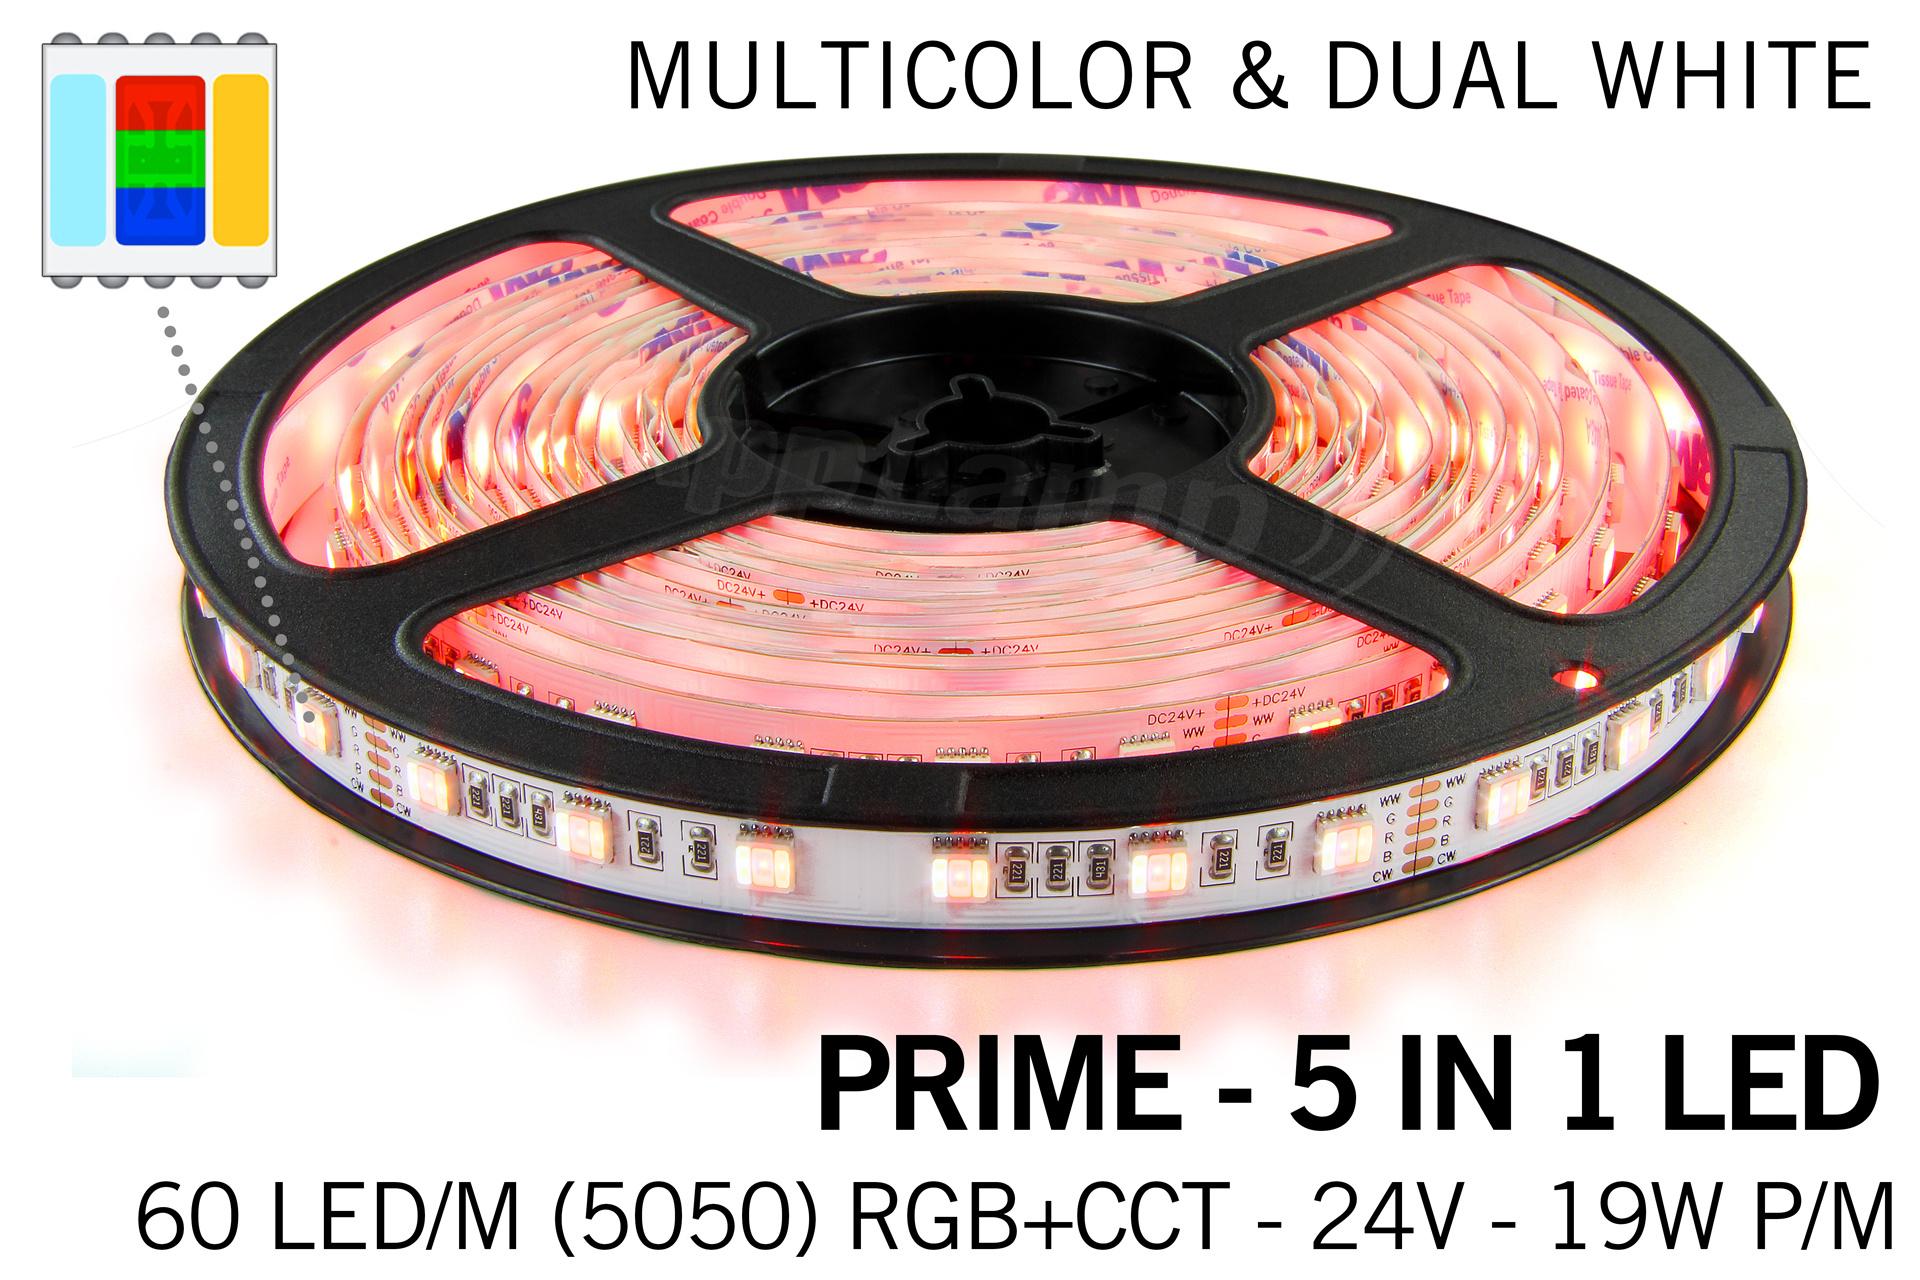 PRIME Ledstrip RGB Color+Dual White 60 LED-m, 5 in 1